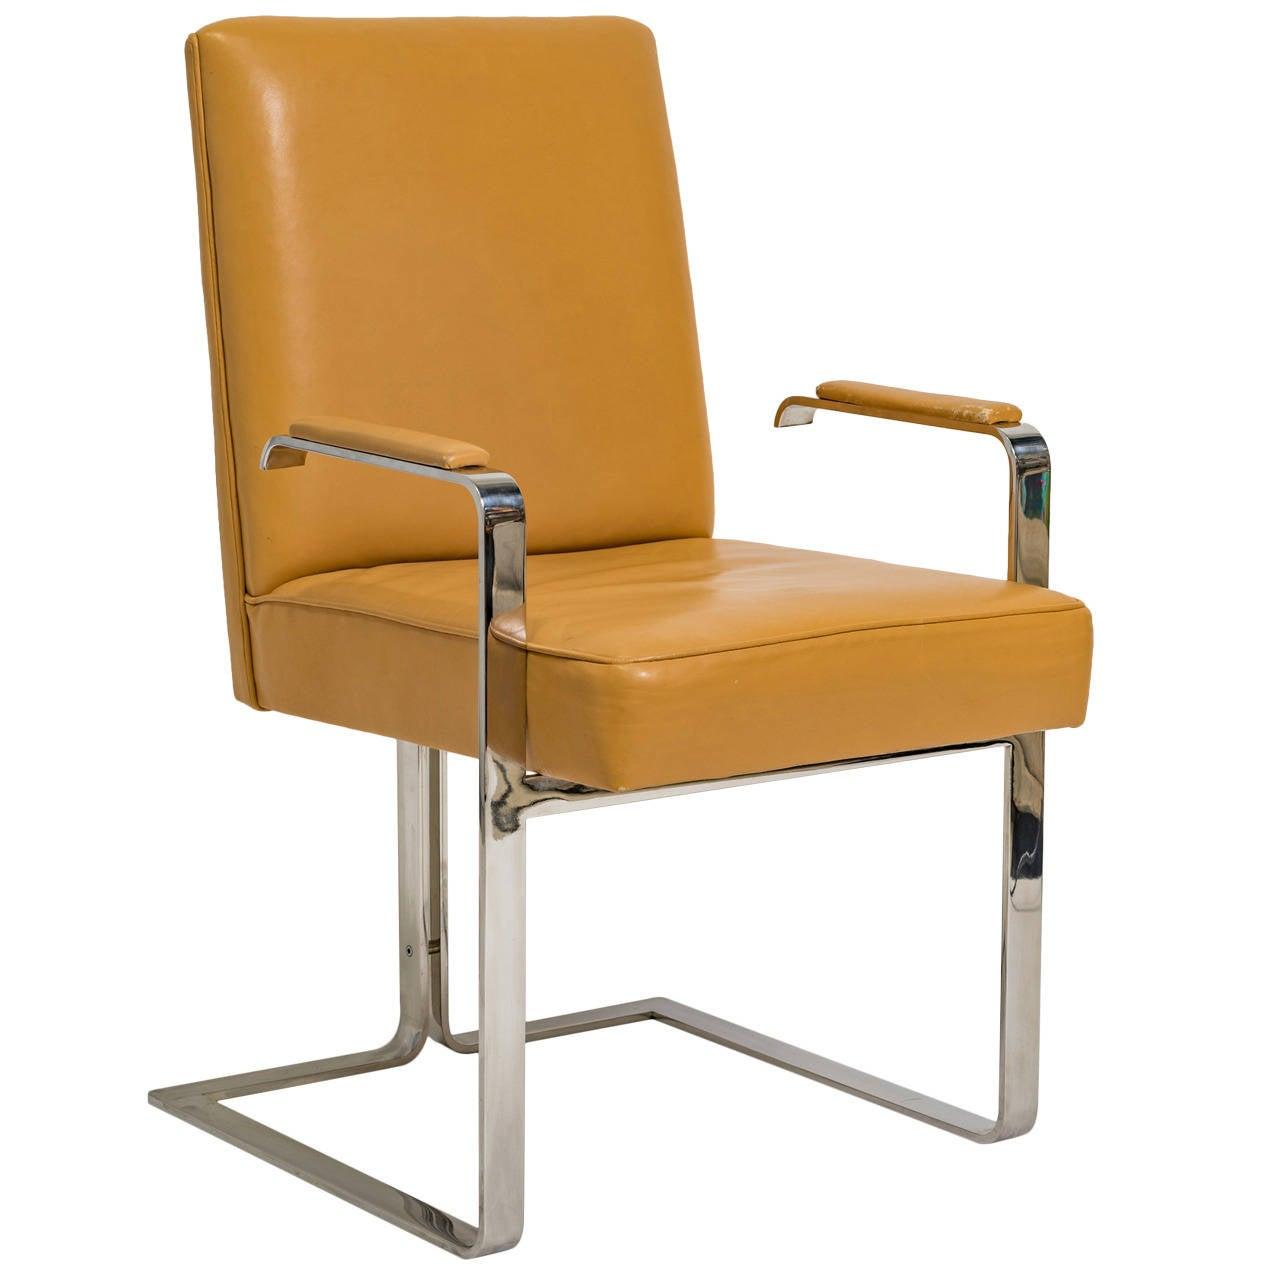 Vladimir Kagan Chrome and Leather Chair For Sale